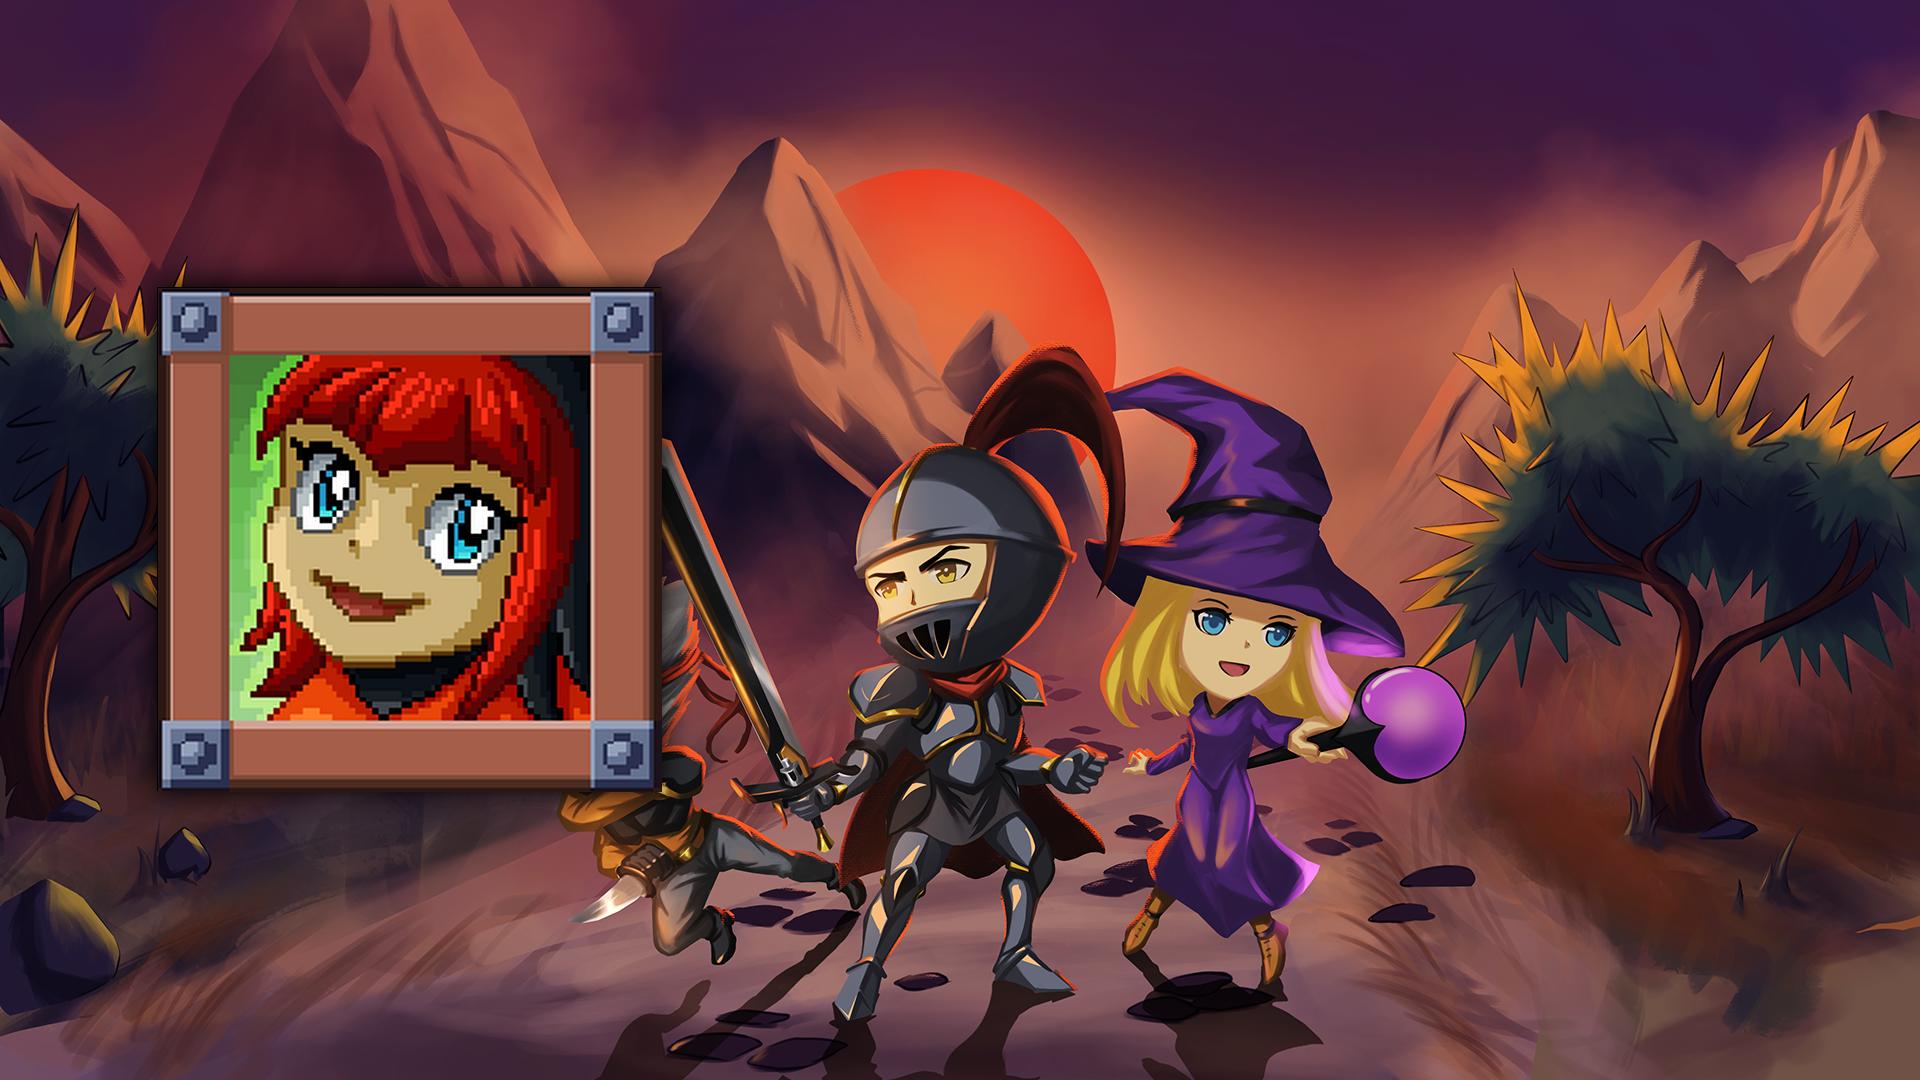 Icon for Treasure Opener Lvl 1